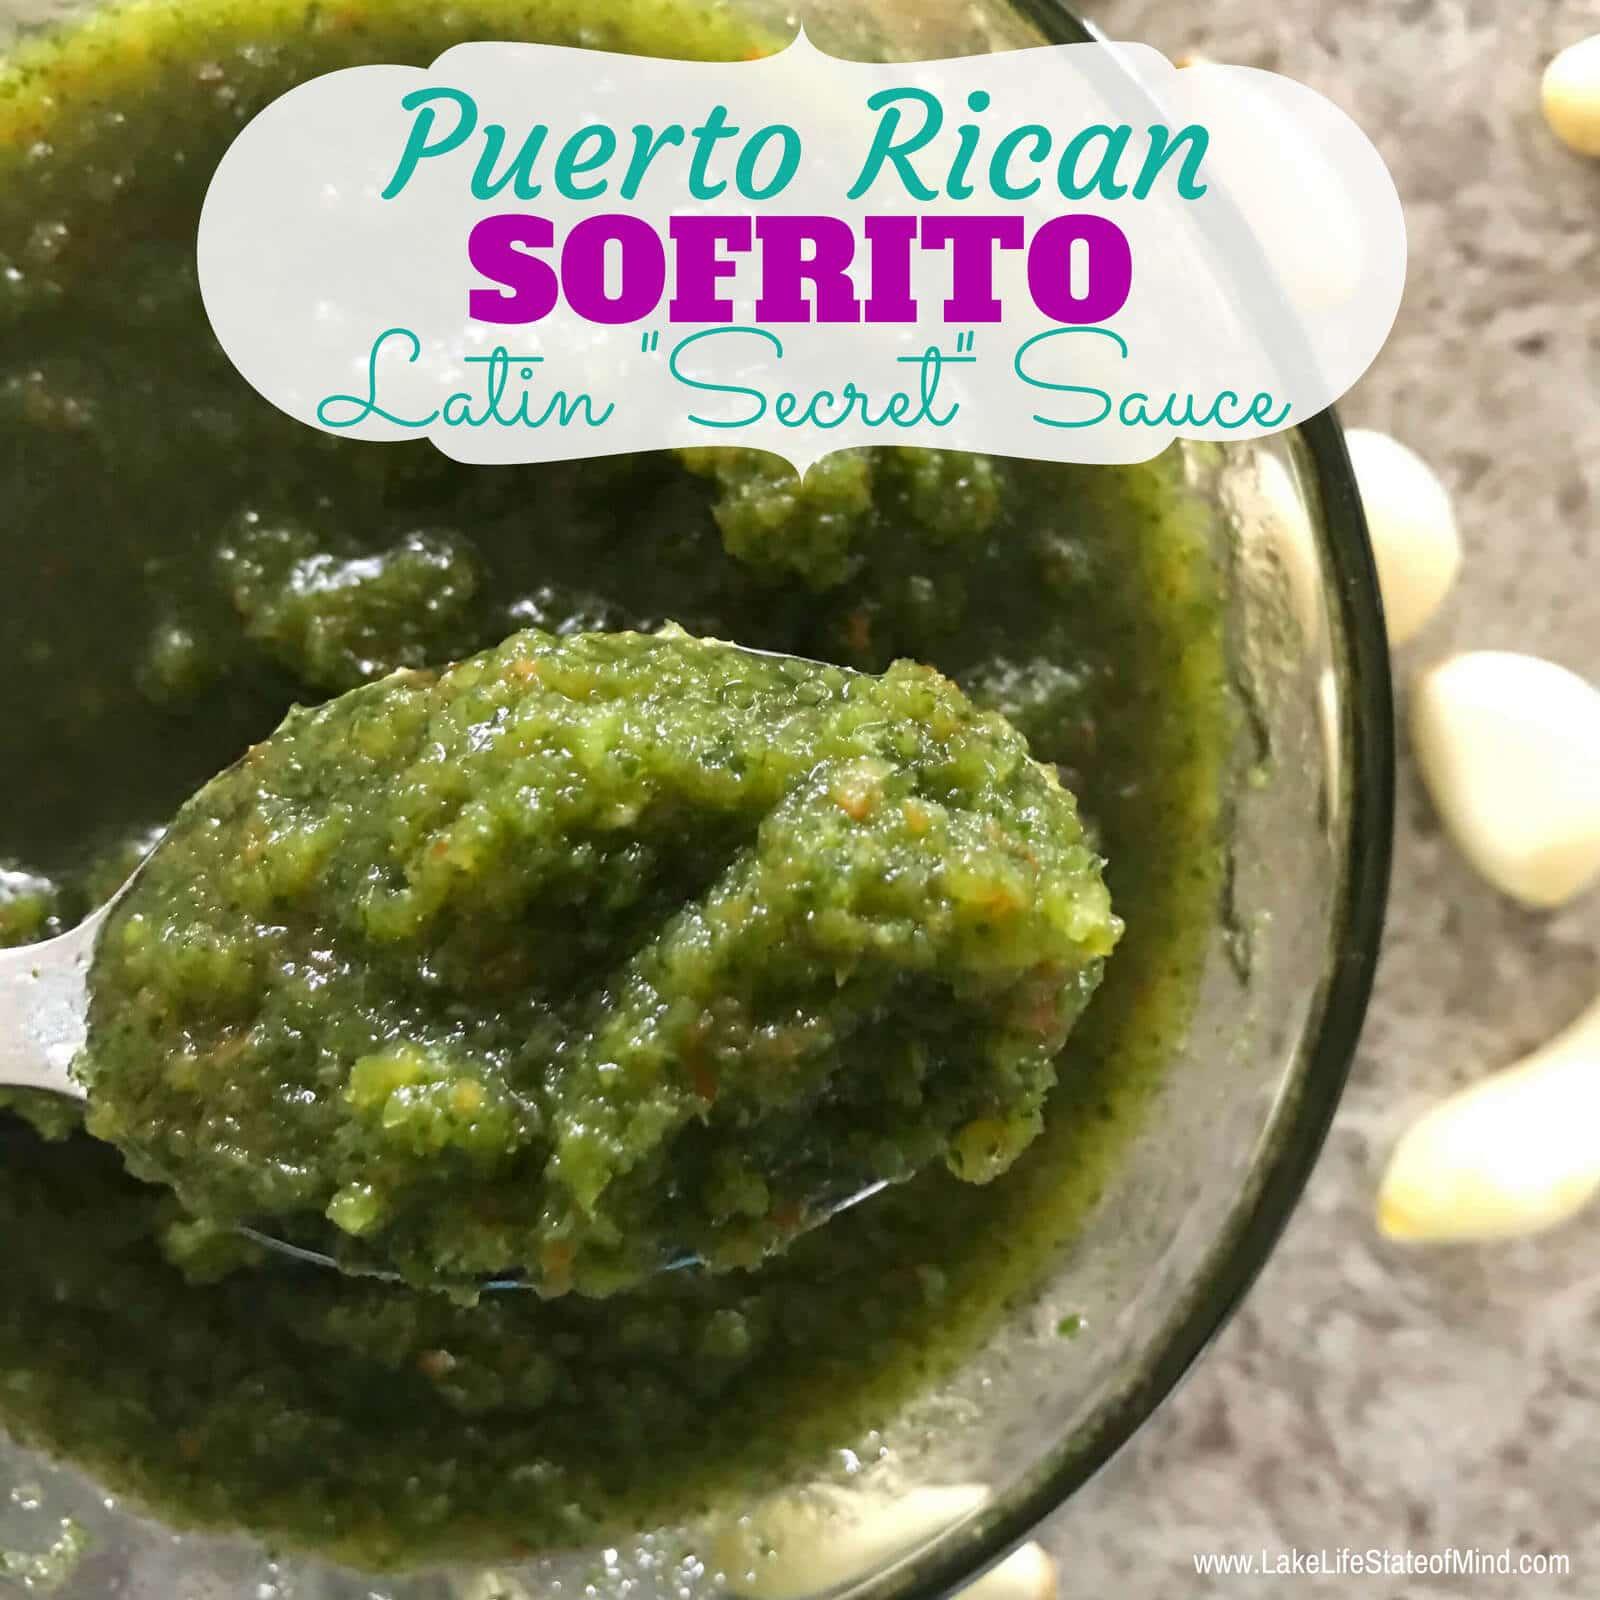 Puerto Rican Sofrito